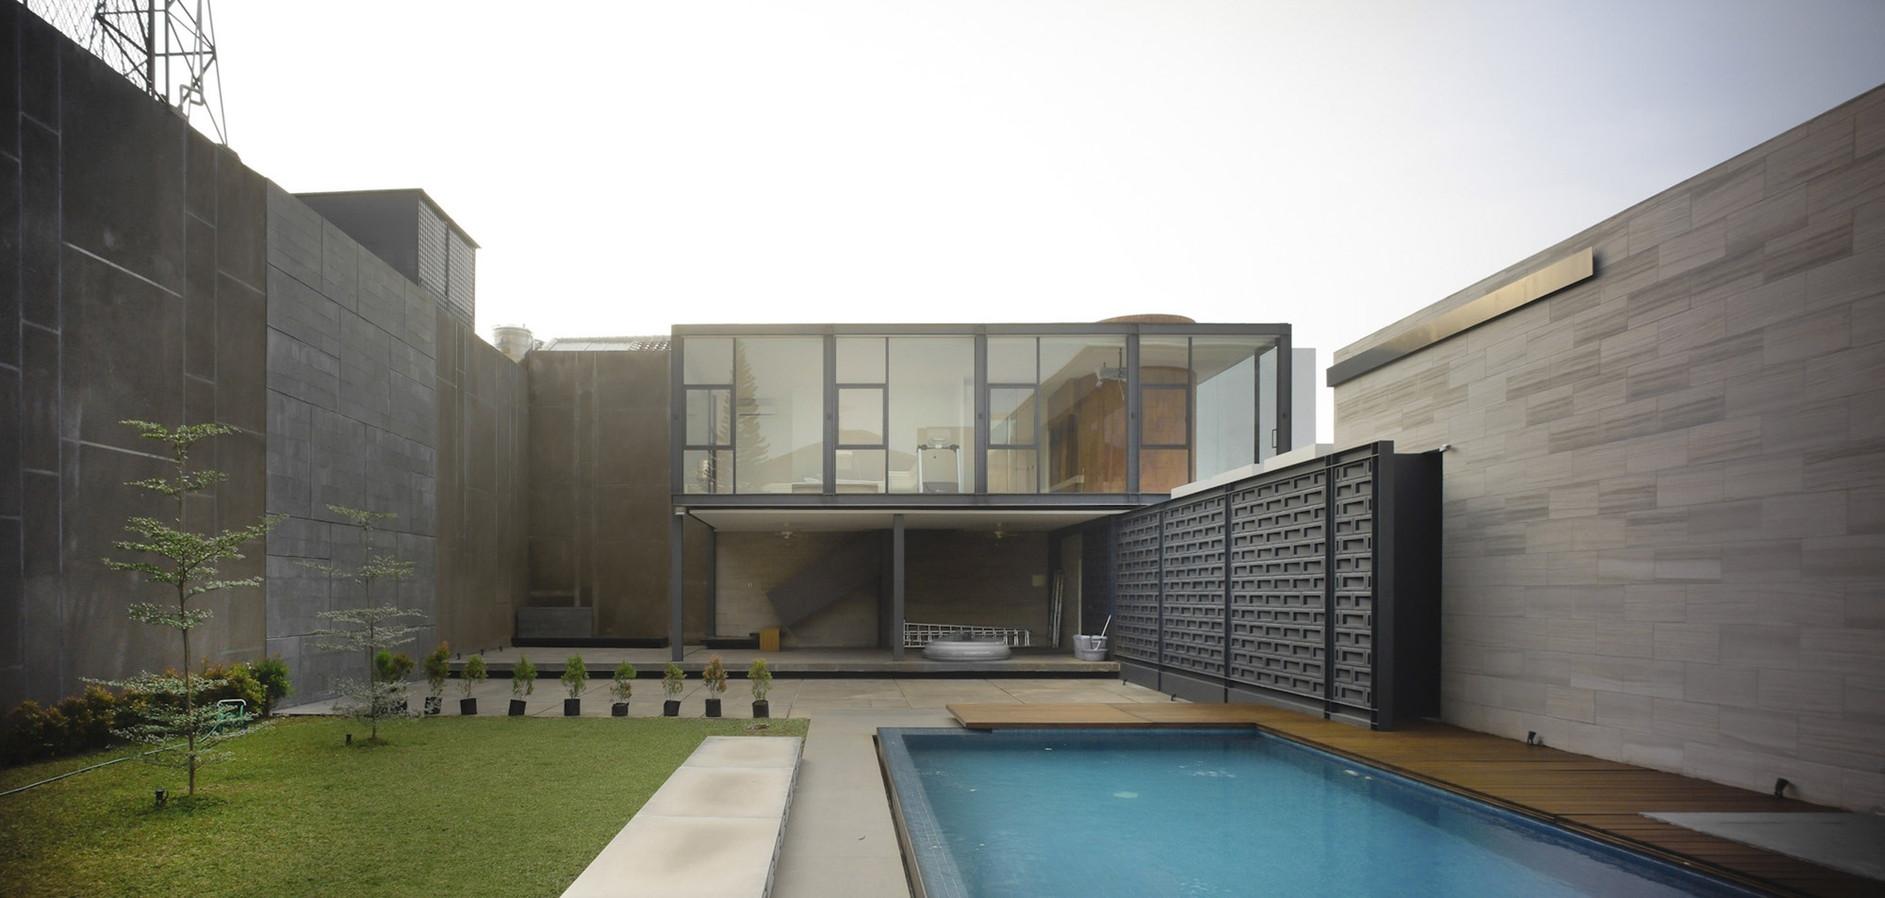 rumah bidang jakarta by raul renanda design karmatrendz